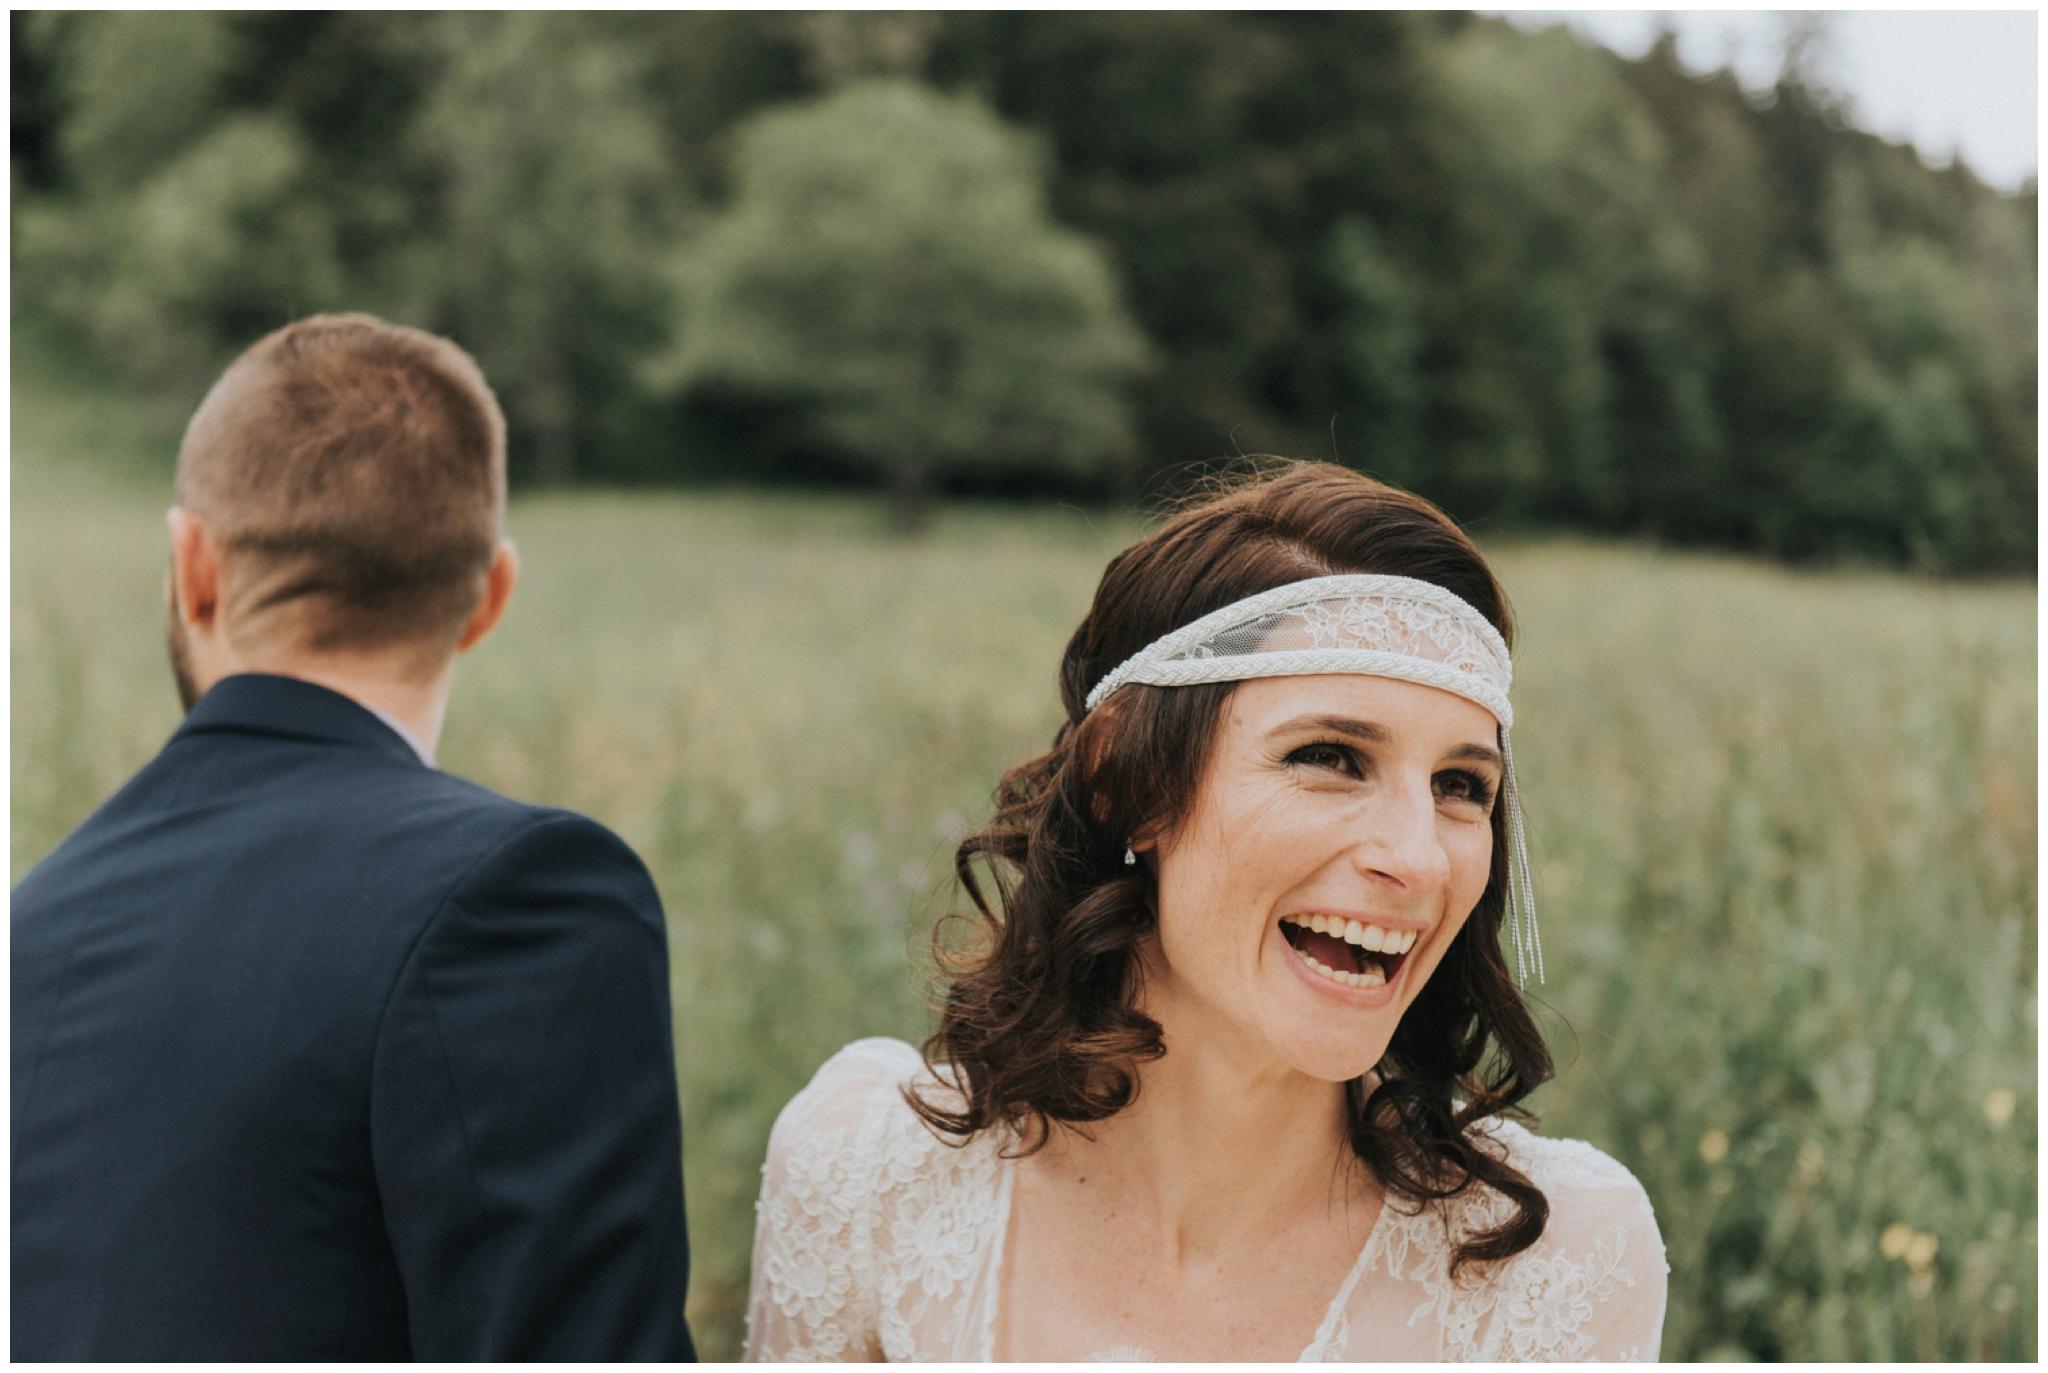 photographe-mariage-montagne-vercors-boho-folk-grenoble-annecy-alpes_0033